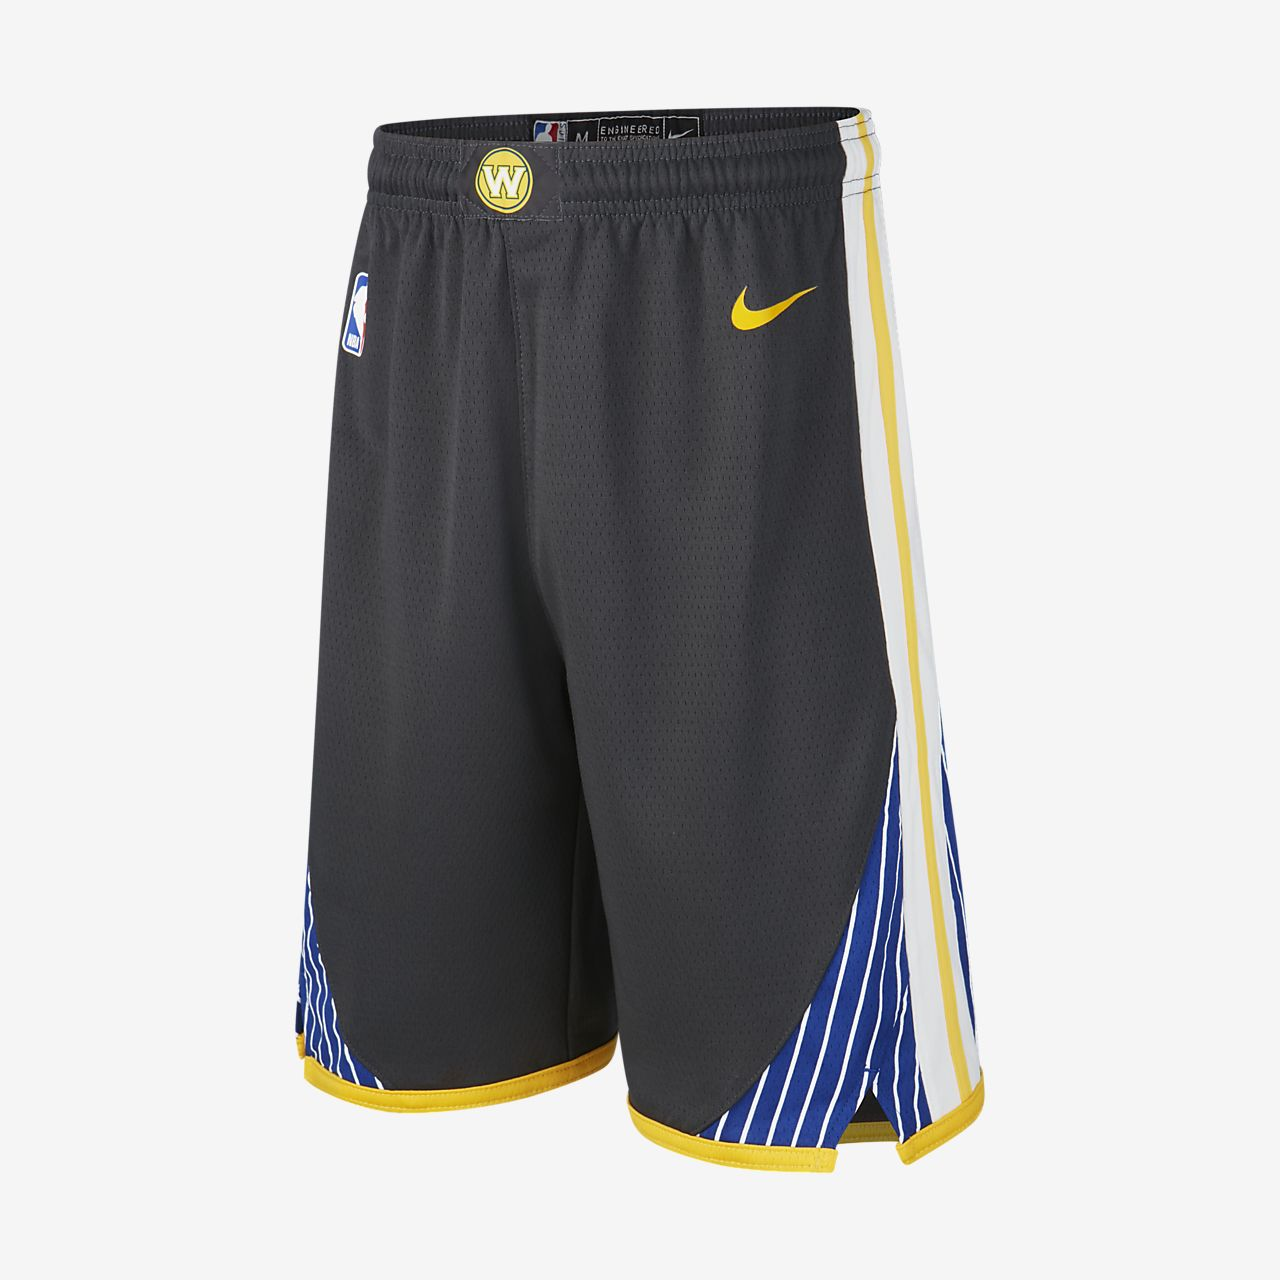 Short NBA Golden State Warriors Nike Statement Edition Swingman pour Enfant